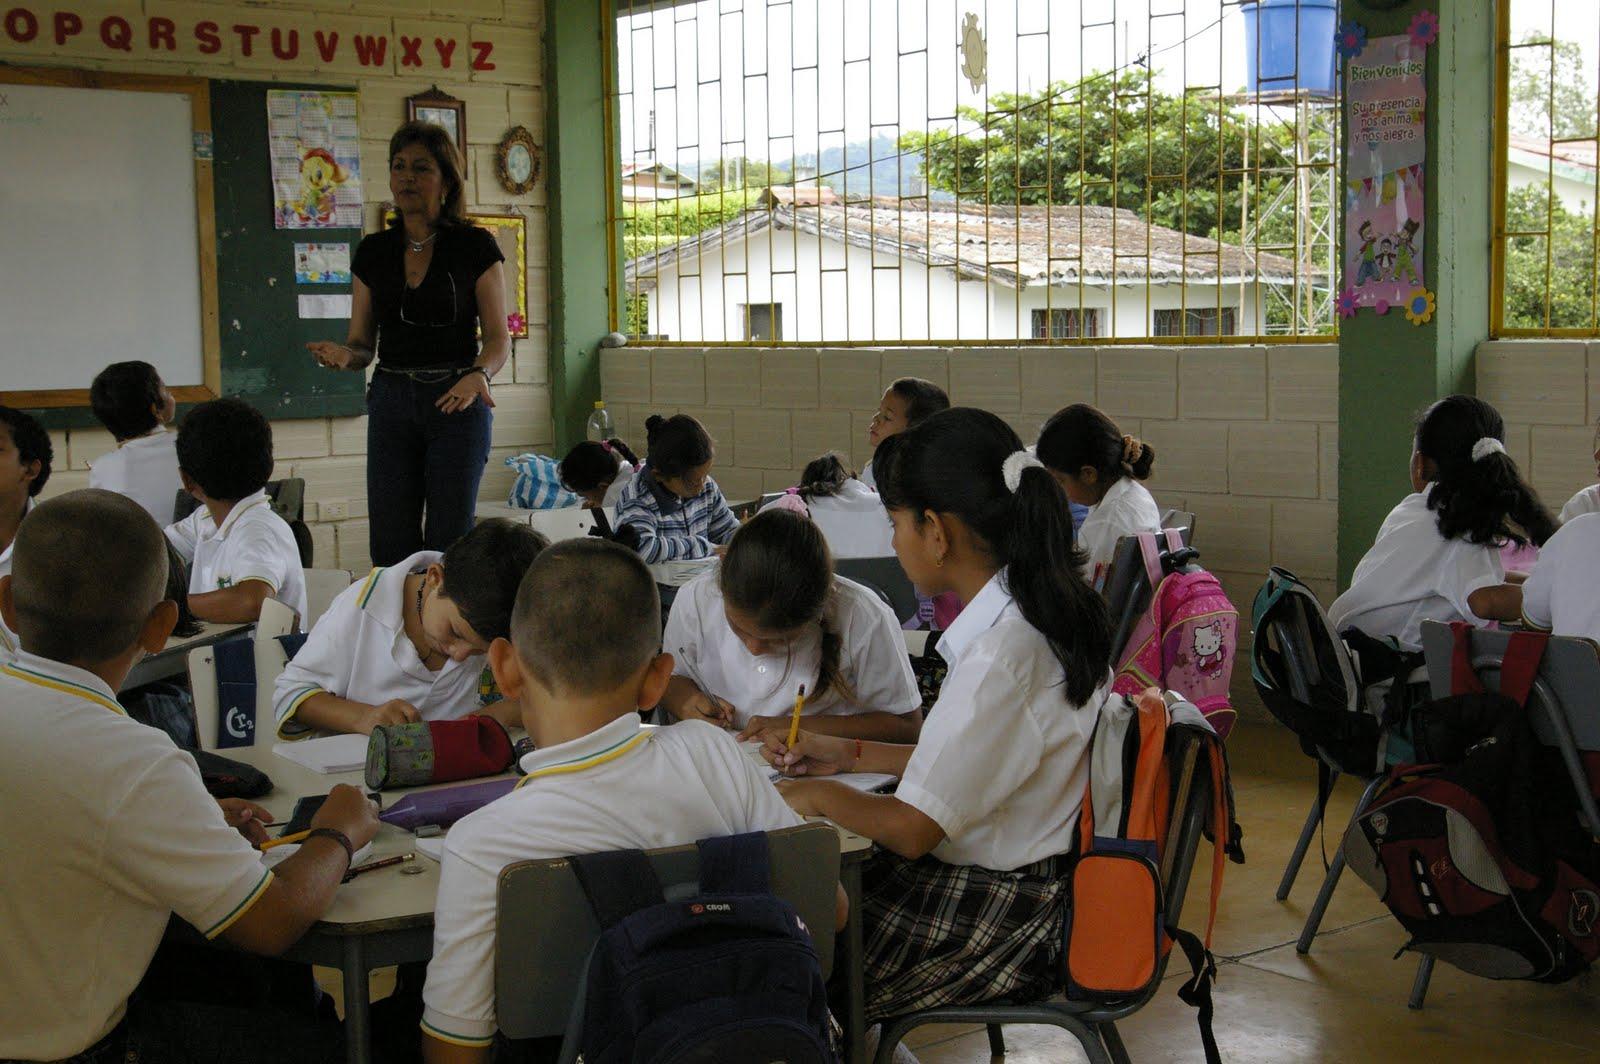 Marruecos implementar a modelo de educaci n rural caldense for Educacion exterior marruecos